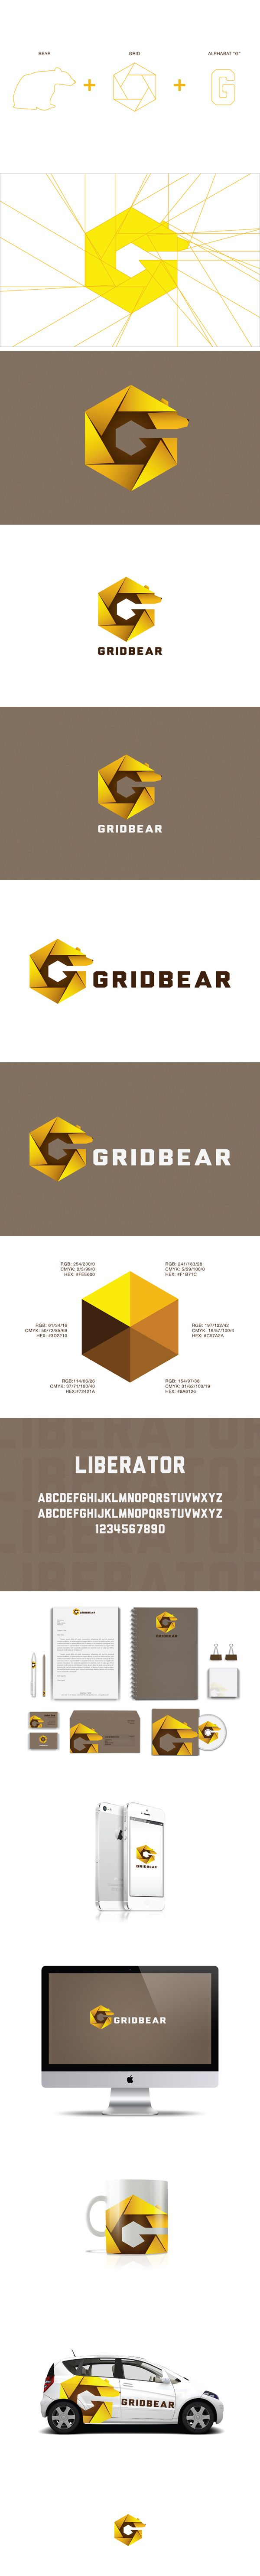 GridBear Visual Identity by www.BlickeDeeler.de | Visit our website: www.blickedeeler.de/leistungen/corporate-design